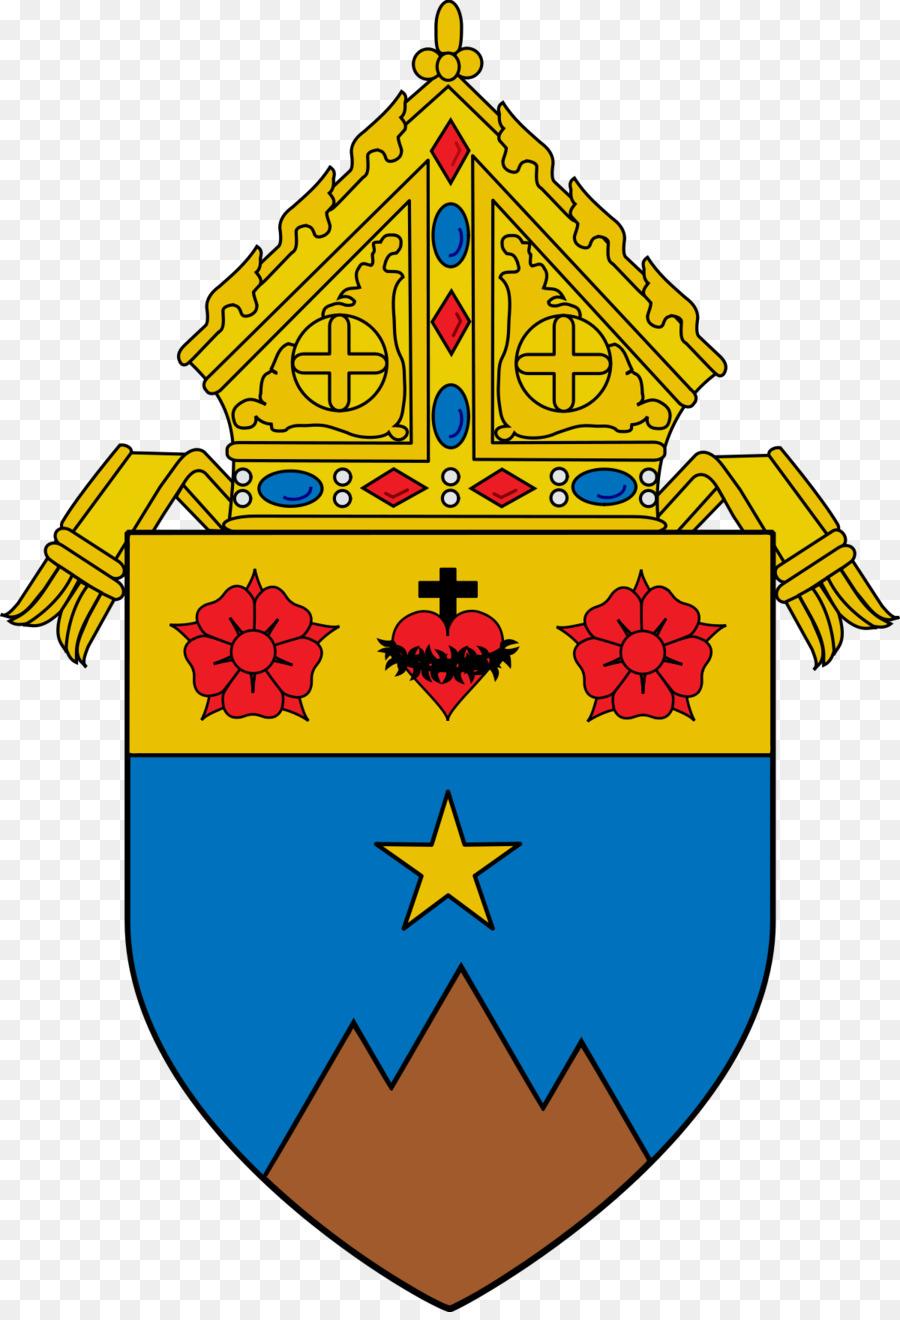 Www archdioceseofcincinnati